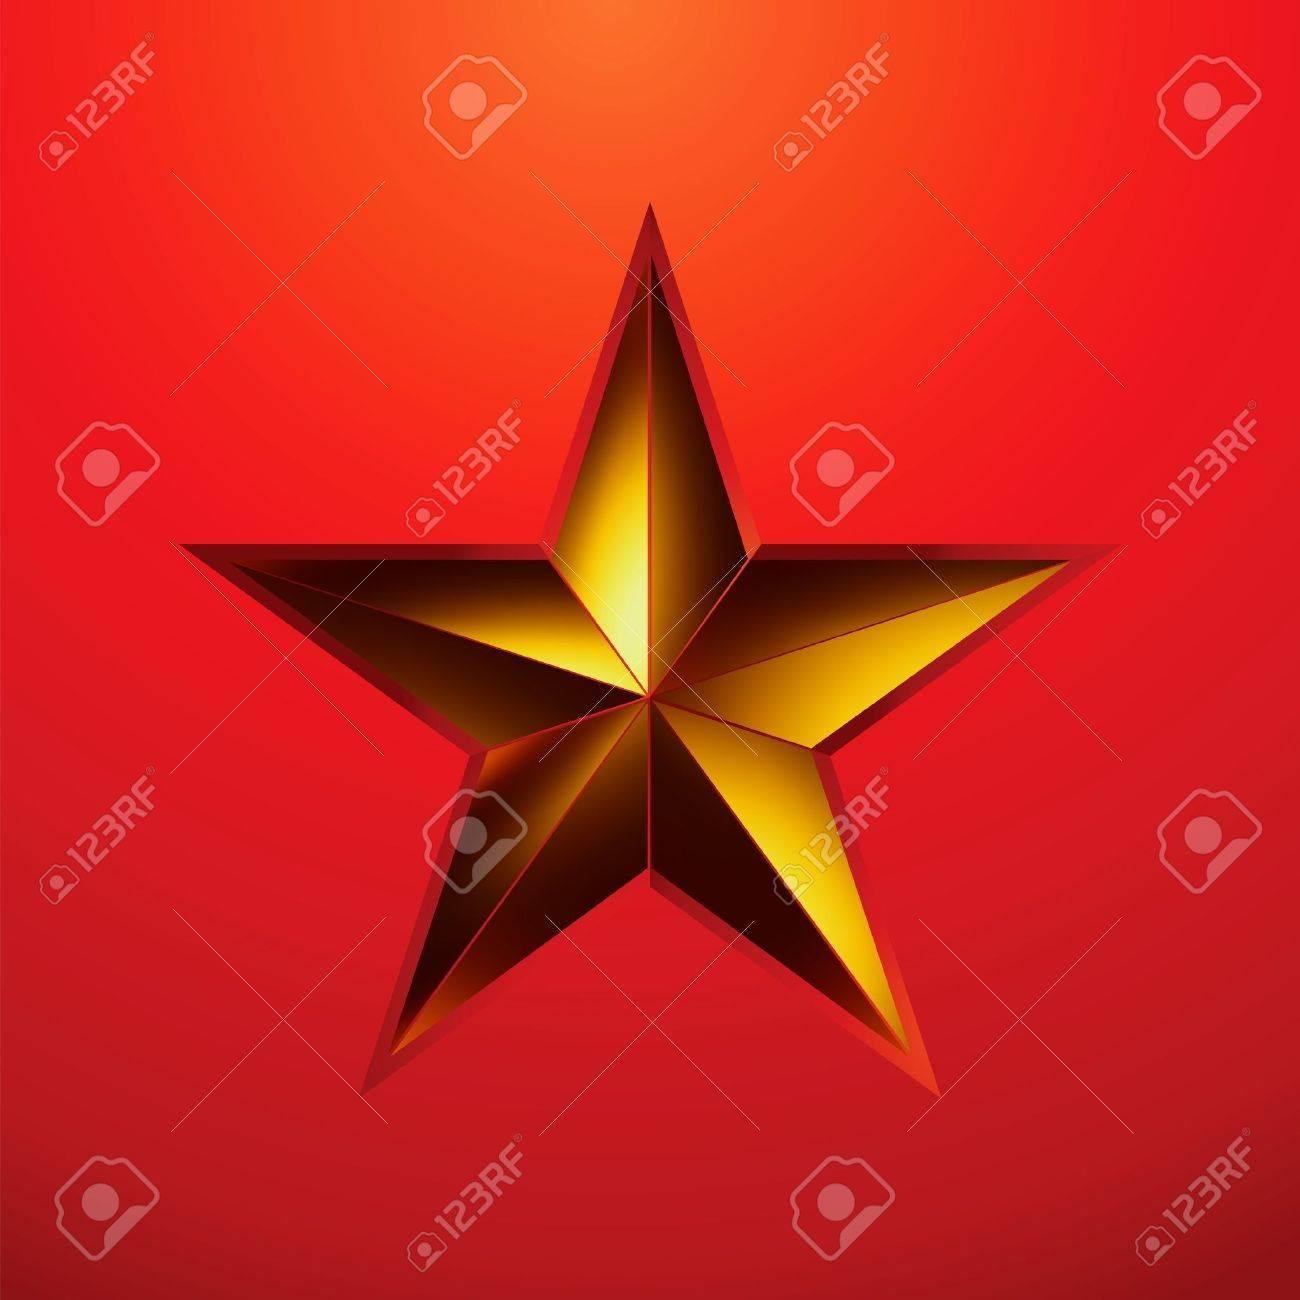 Communist Symbol Star communist symbol